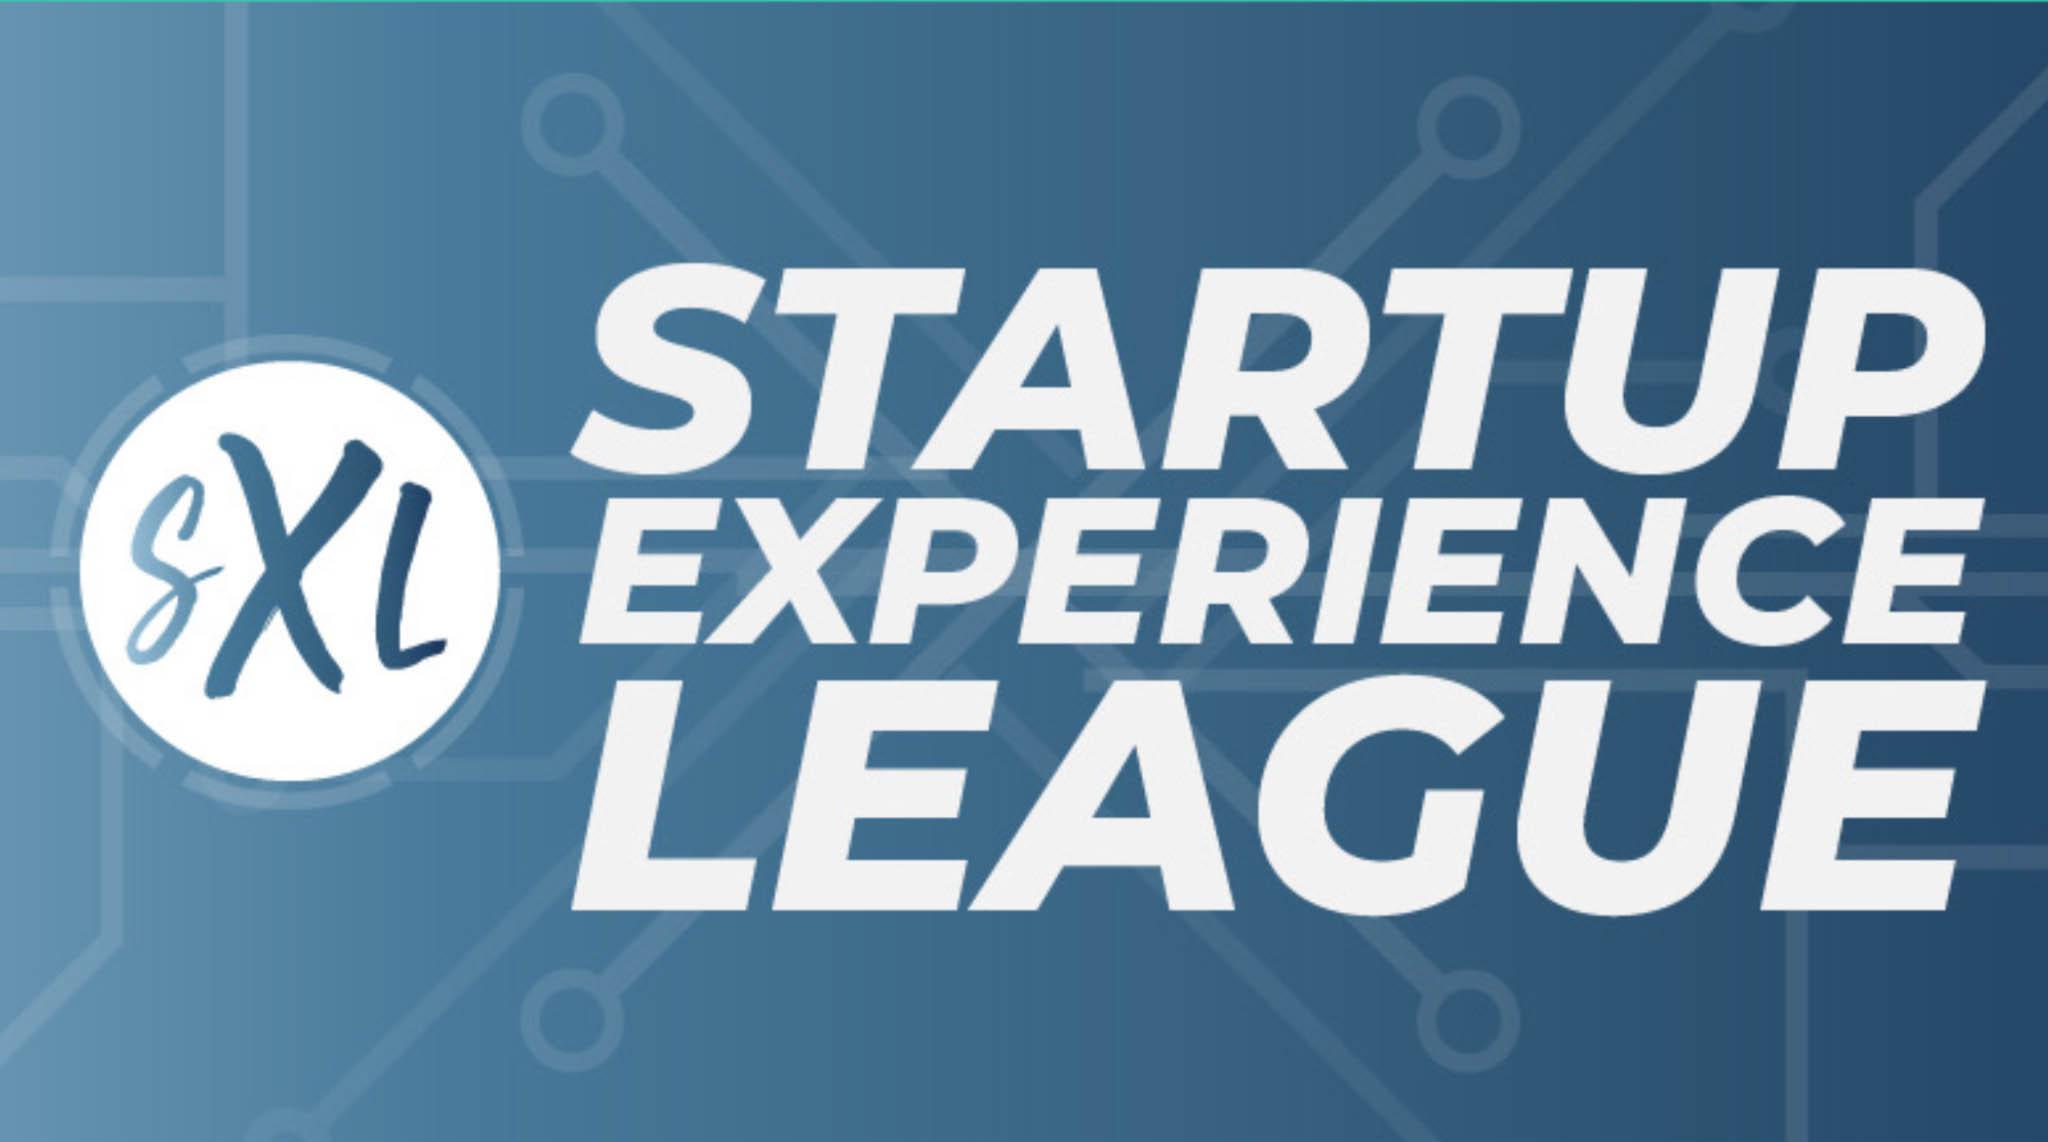 Startup Experience League Orientation @ ICUBE UTM | Mississauga | Ontario | Canada